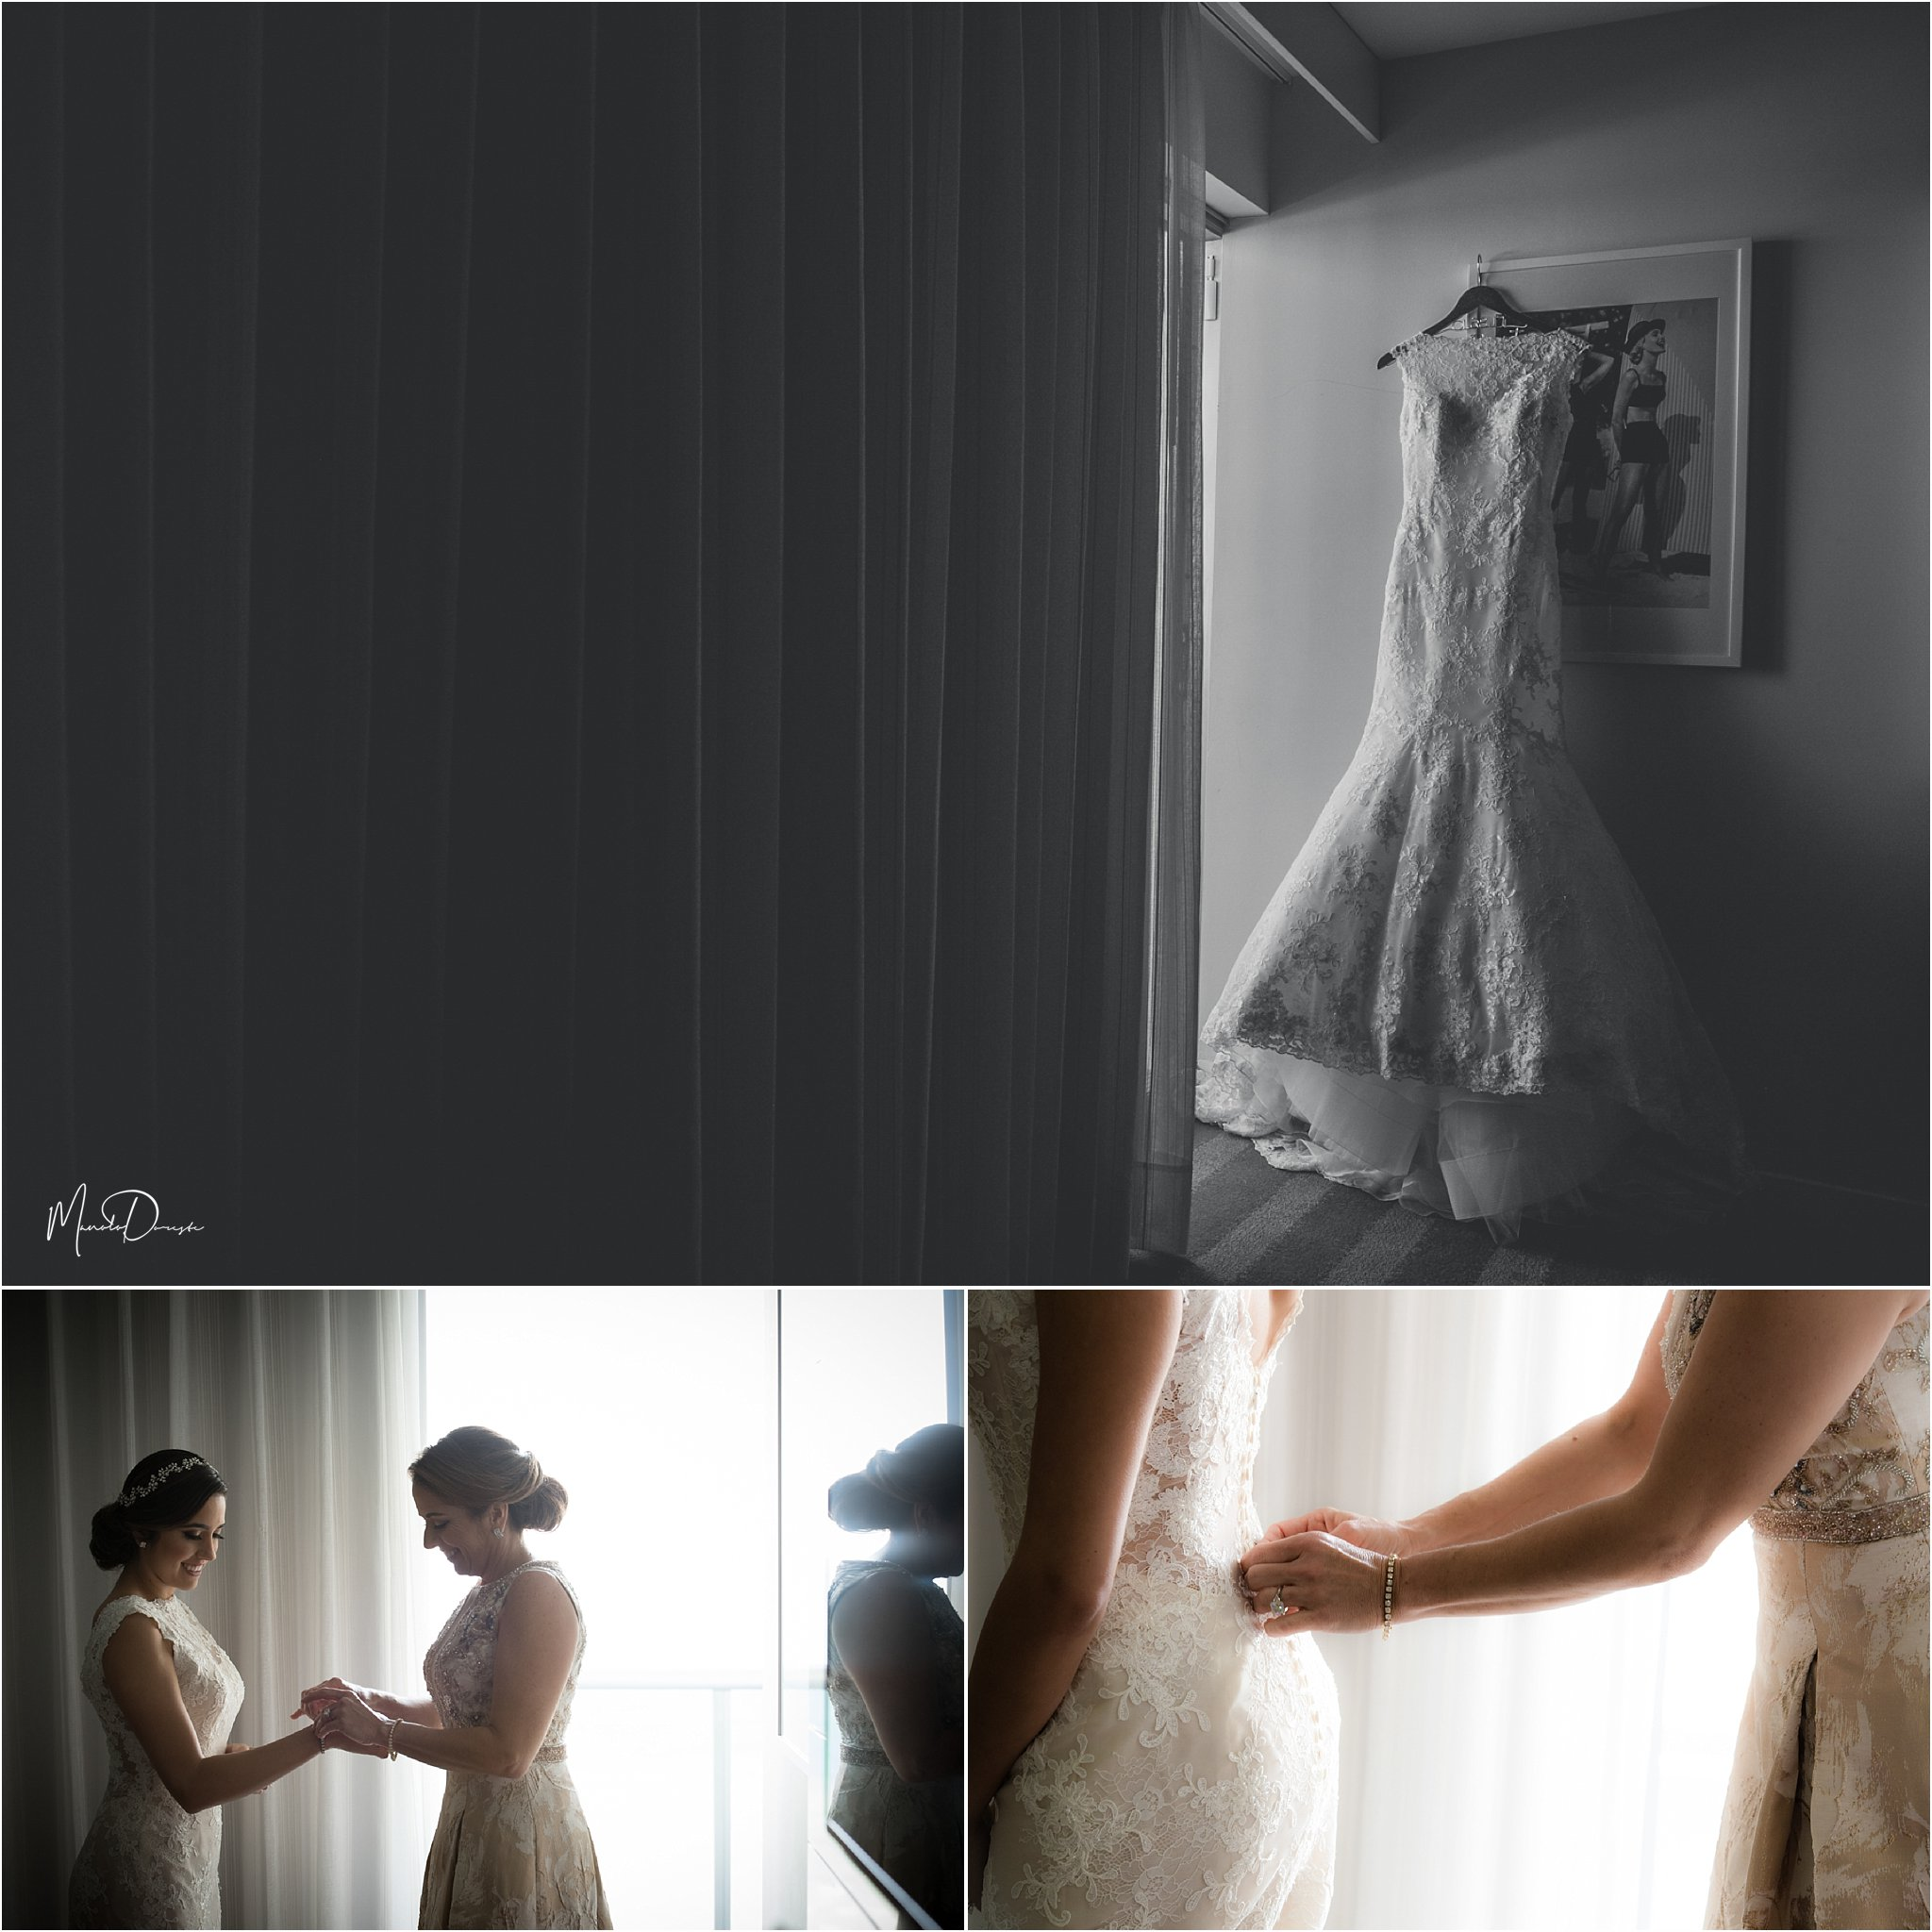 00927_ManoloDoreste_InFocusStudios_Wedding_Family_Photography_Miami_MiamiPhotographer.jpg